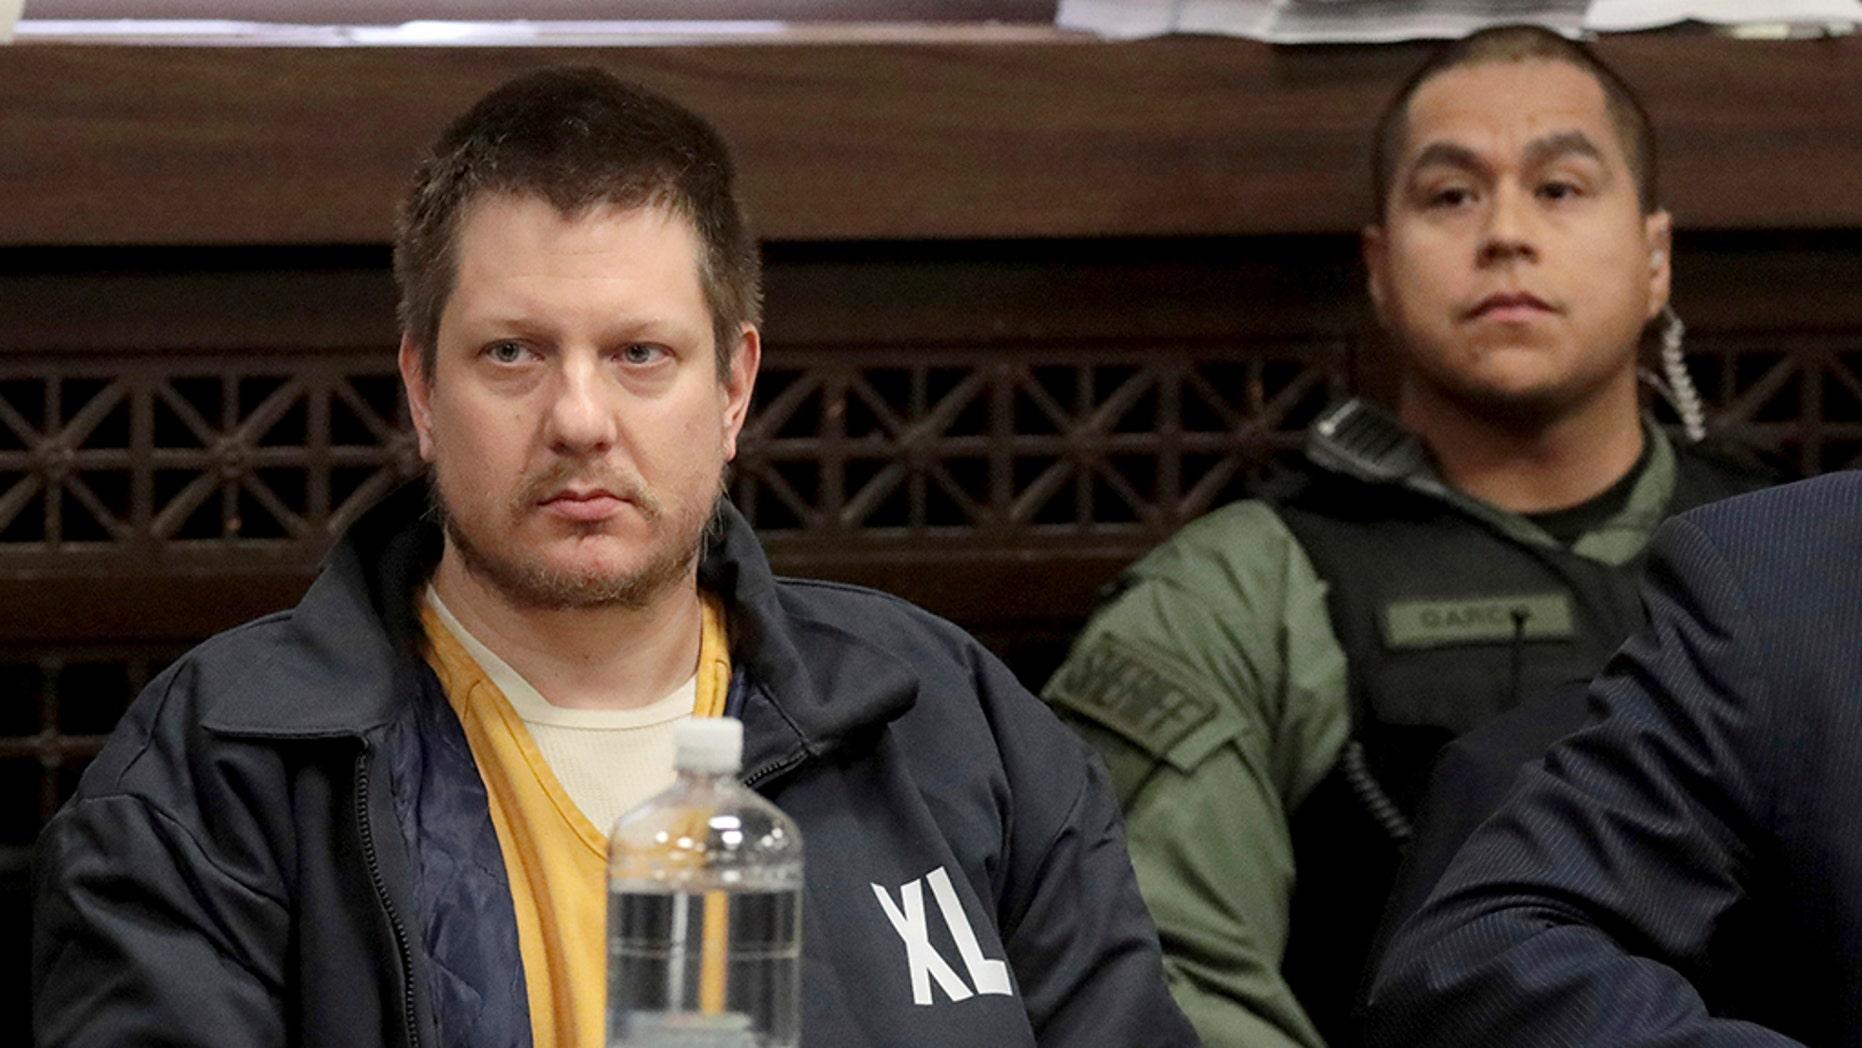 Illinois Attorney General challenges sentencing of former Chicago officer Jason Van Dyke